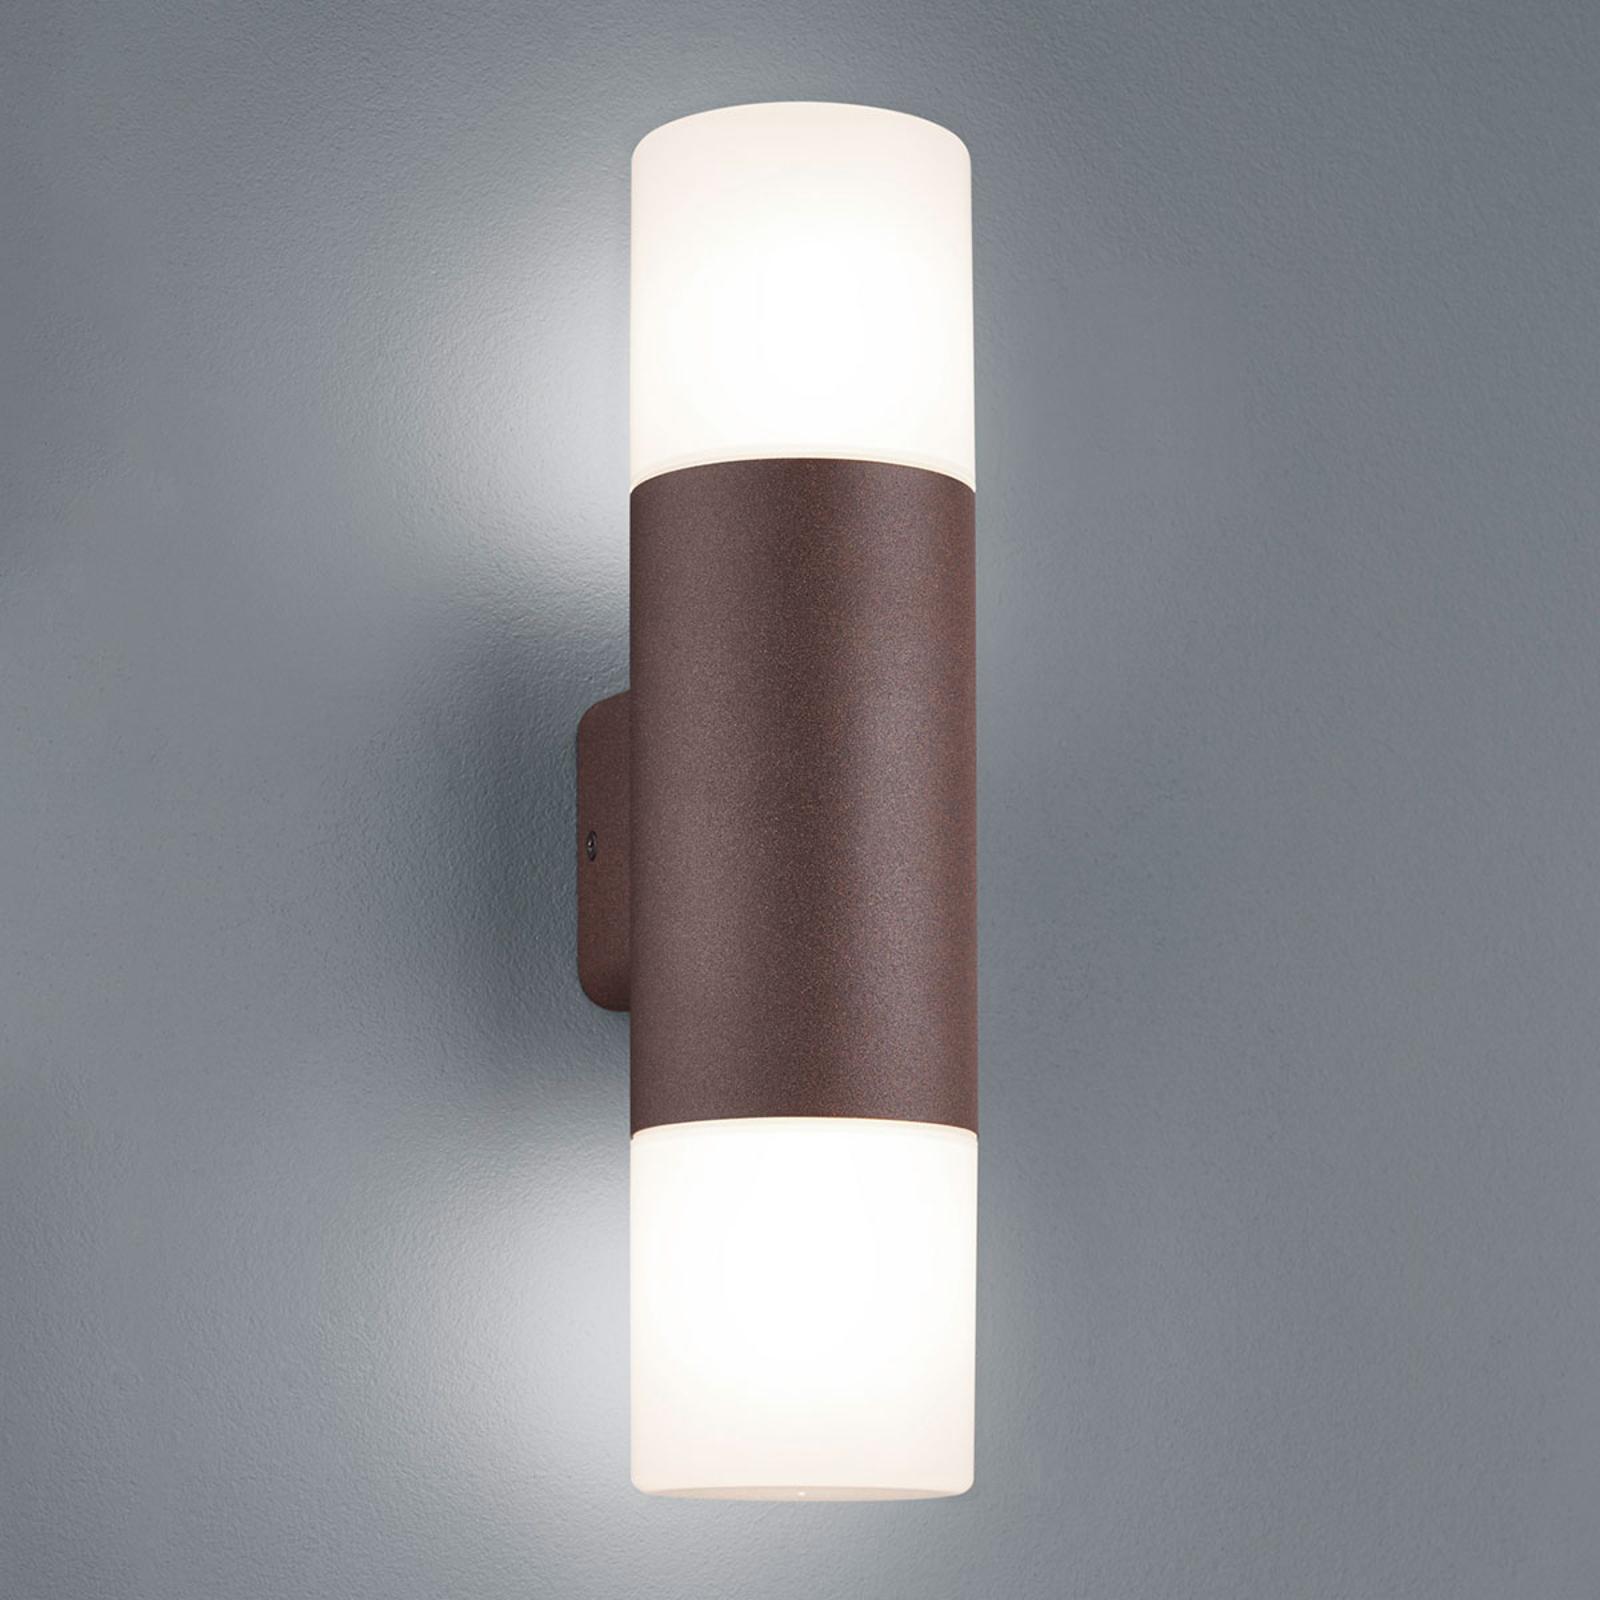 Außenwandlampe Hoosic 2-flammig rost